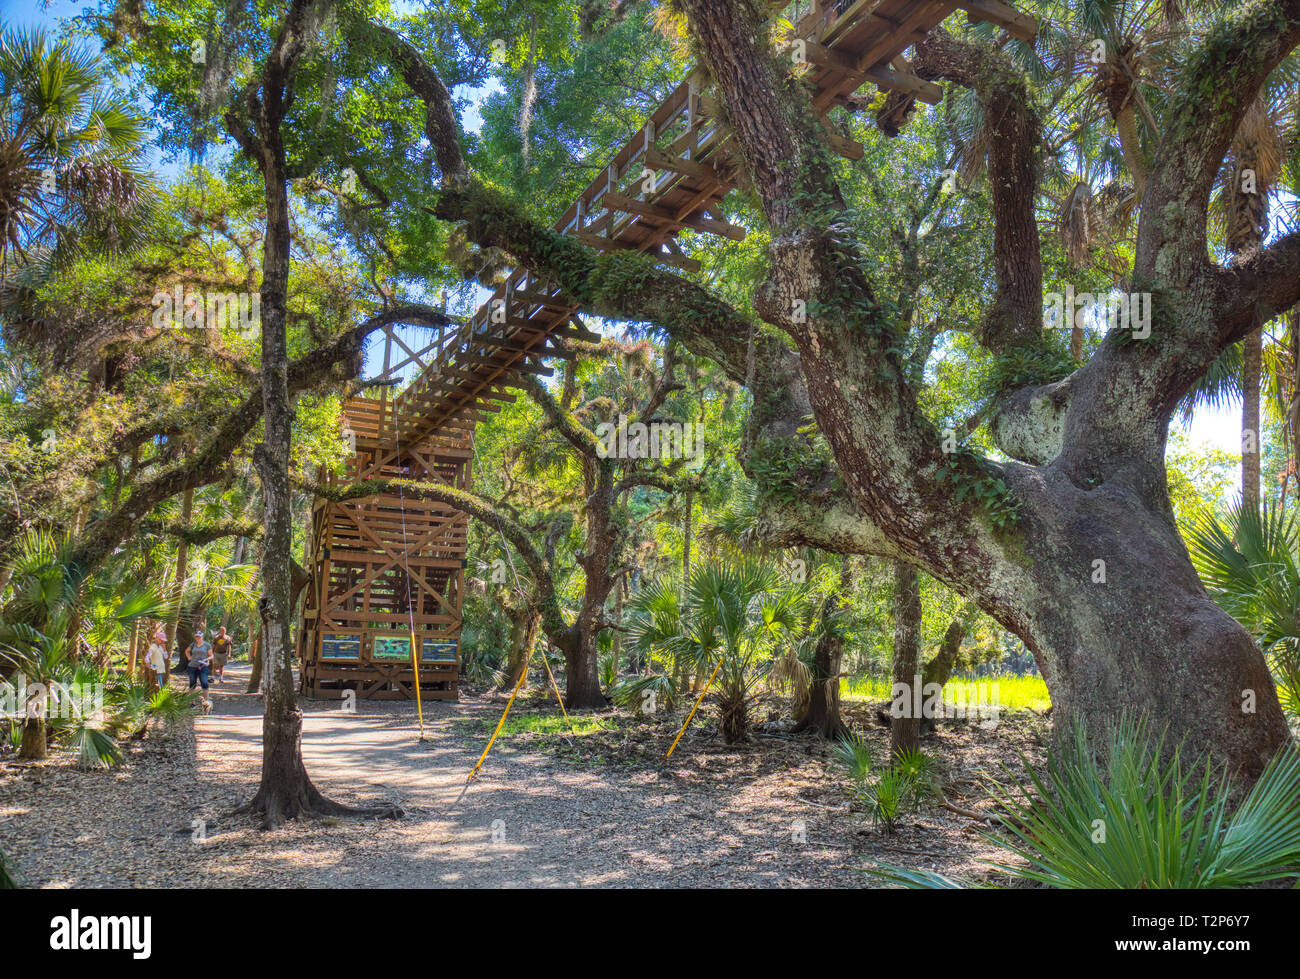 Canopy Walk suspension bridge tourist attraction in Myakka River State Park in Sarasota Florida, tree, trees Stock Photo